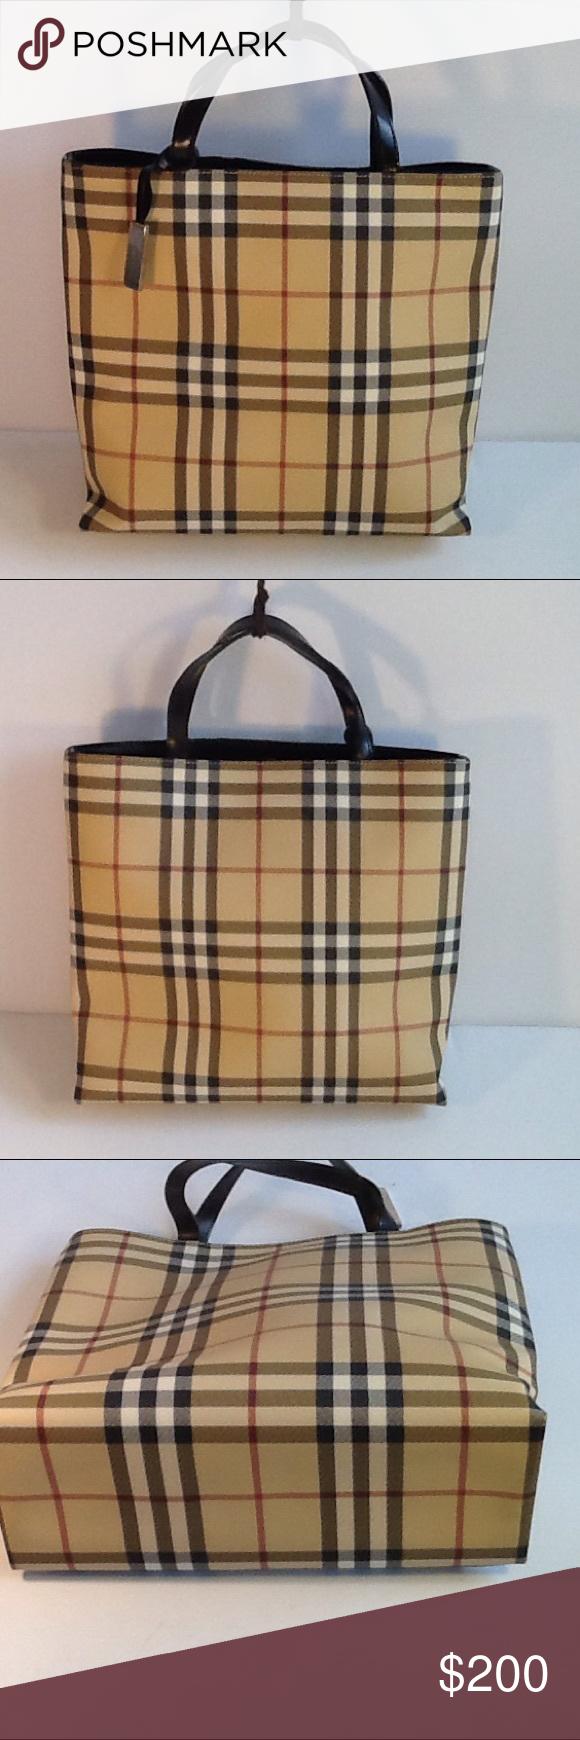 Burberry Bag Dimension